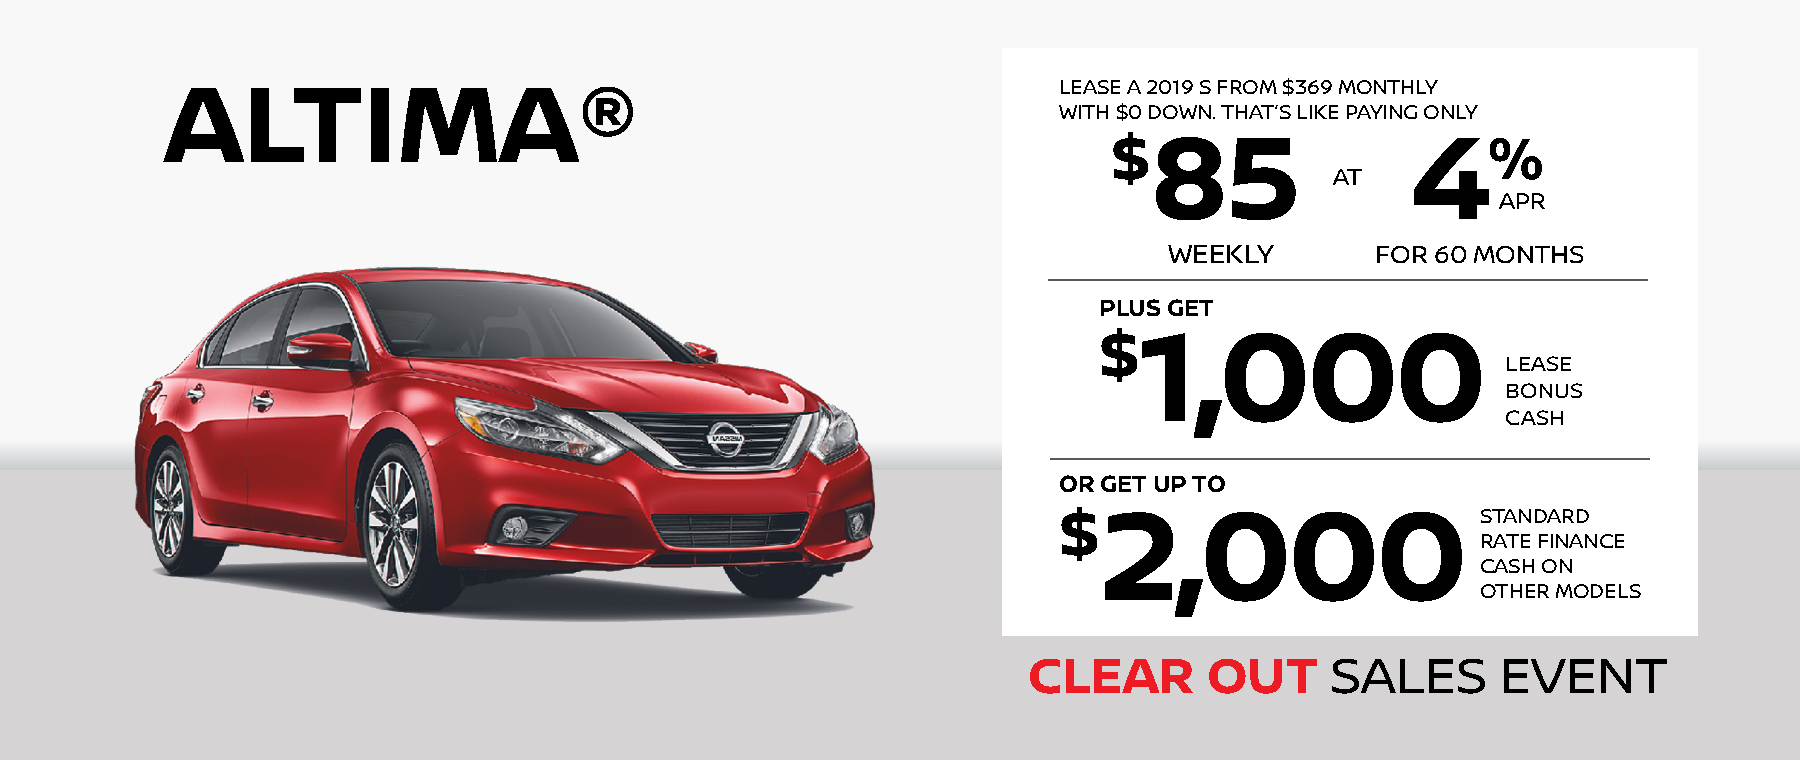 Nissan Altima Deal